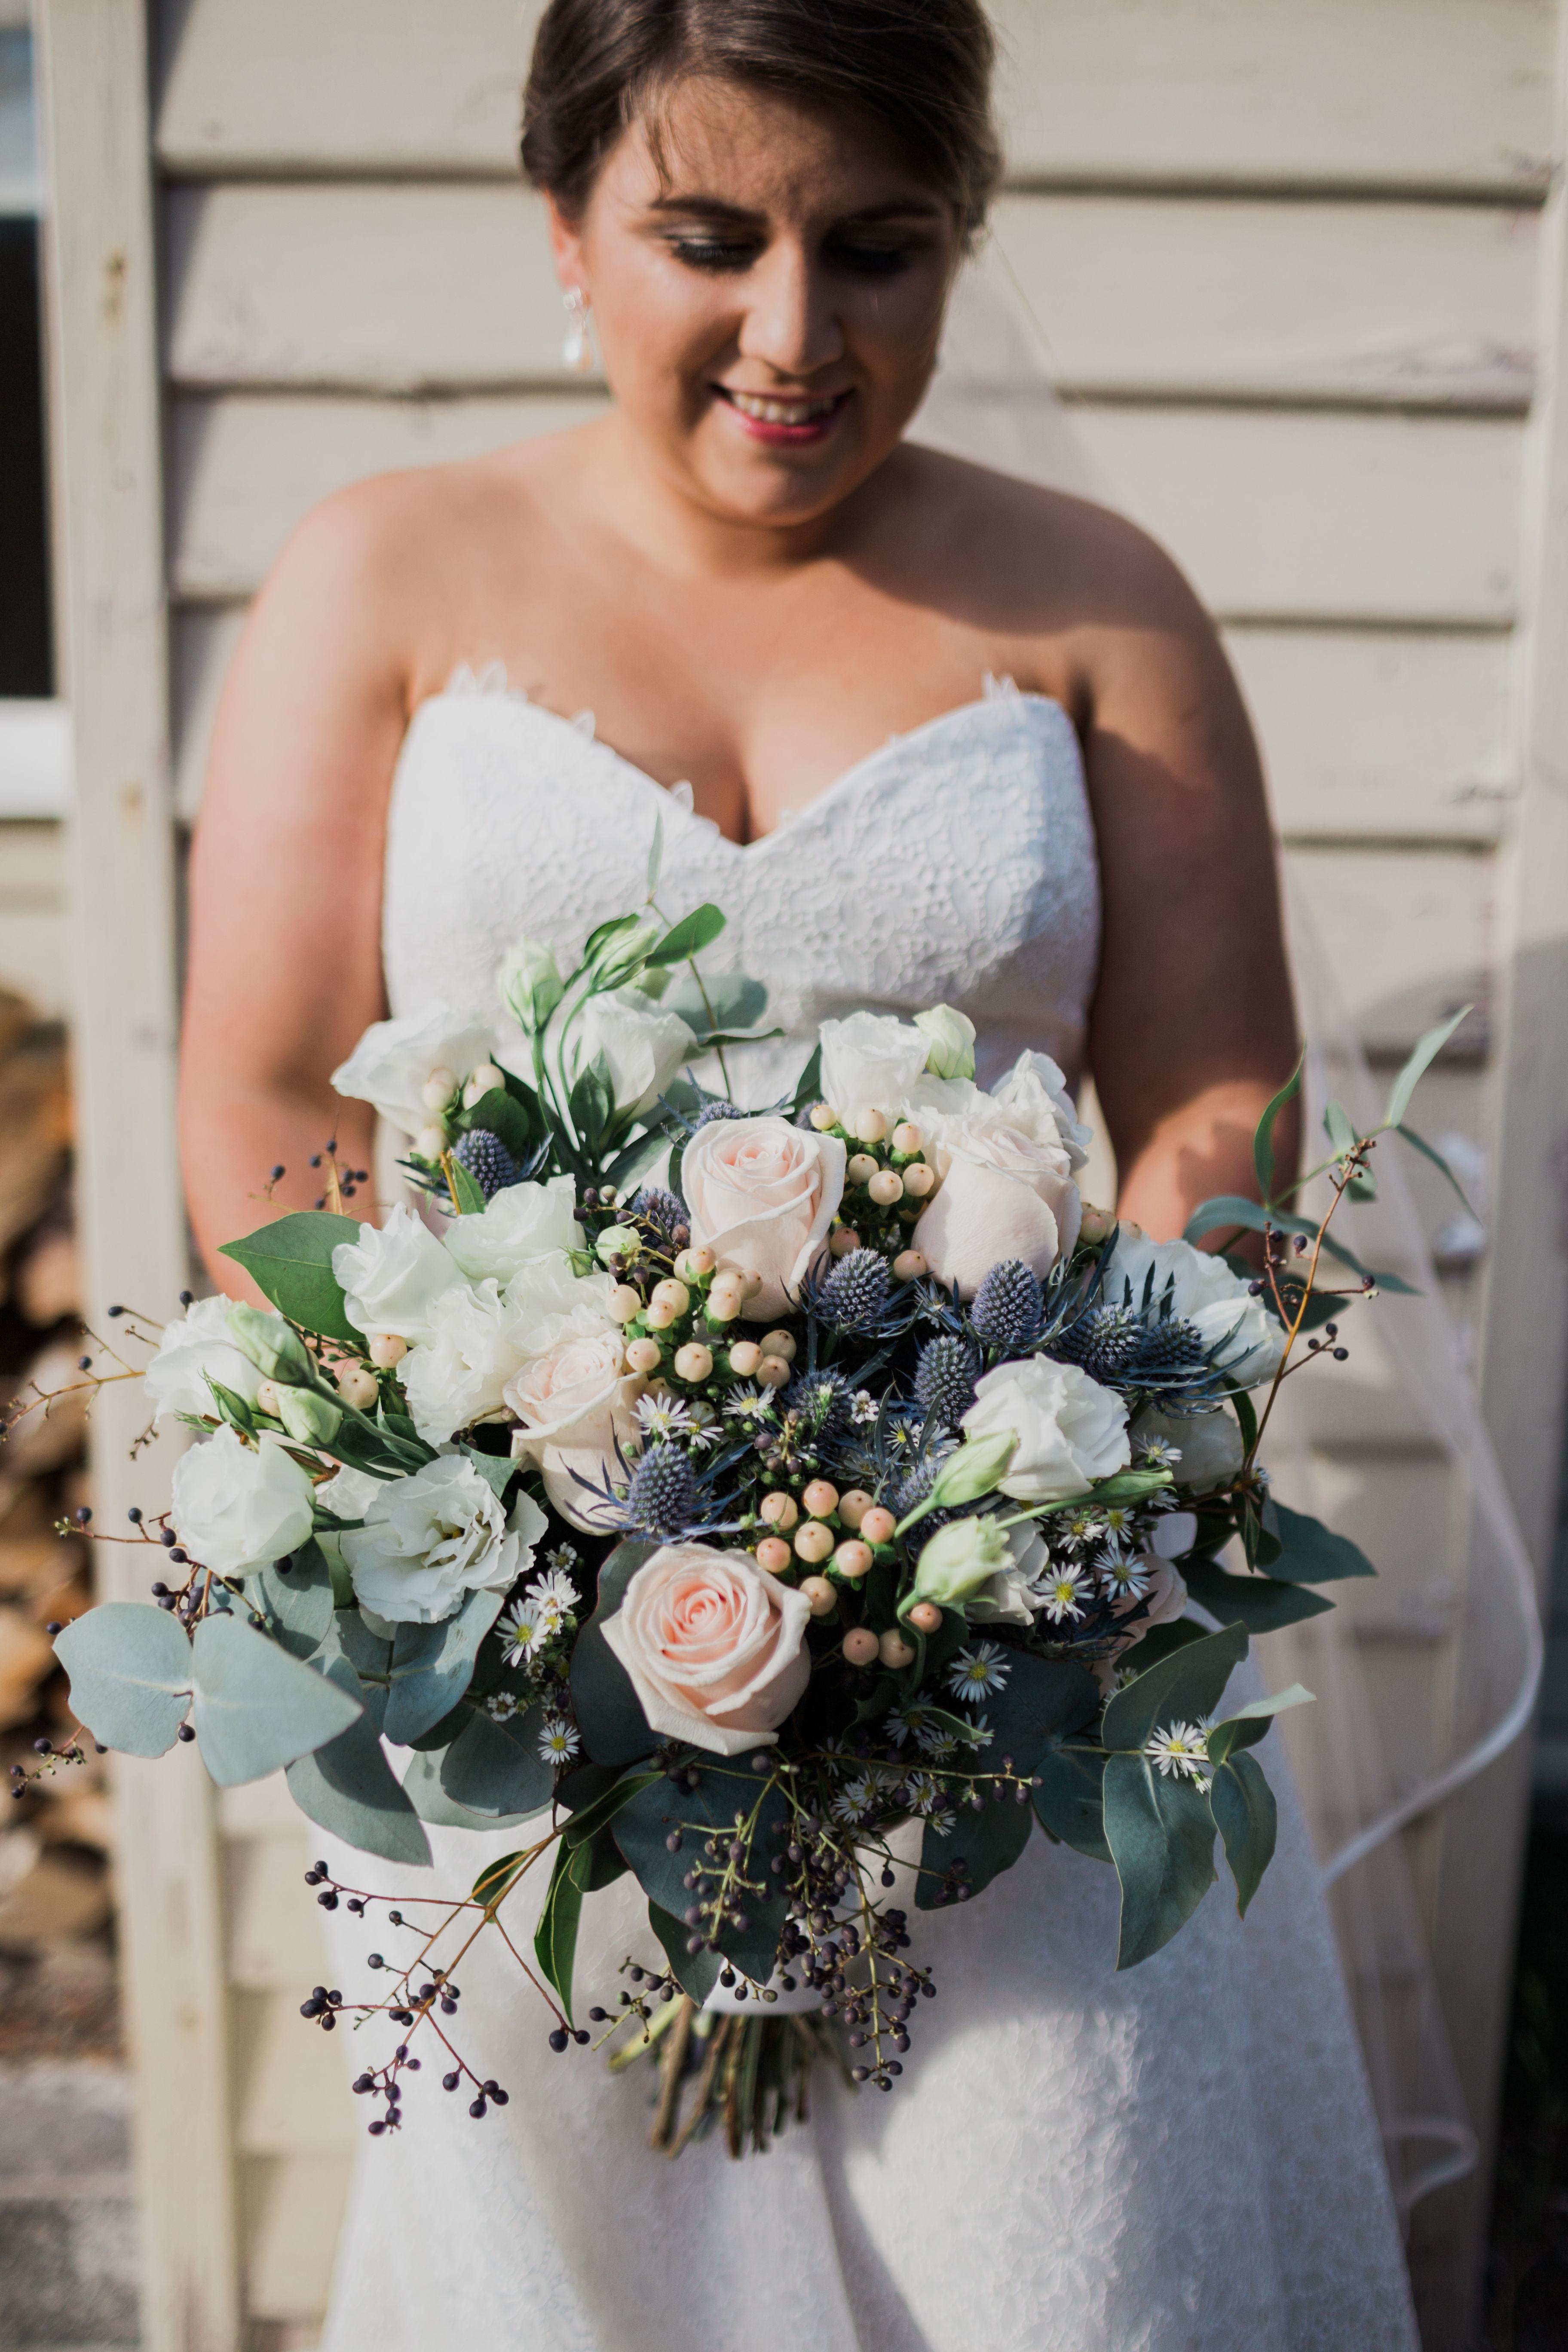 My Large But Beautiful Wedding Bouquet Juliet Roses Sea Holly Hypercuim Berries